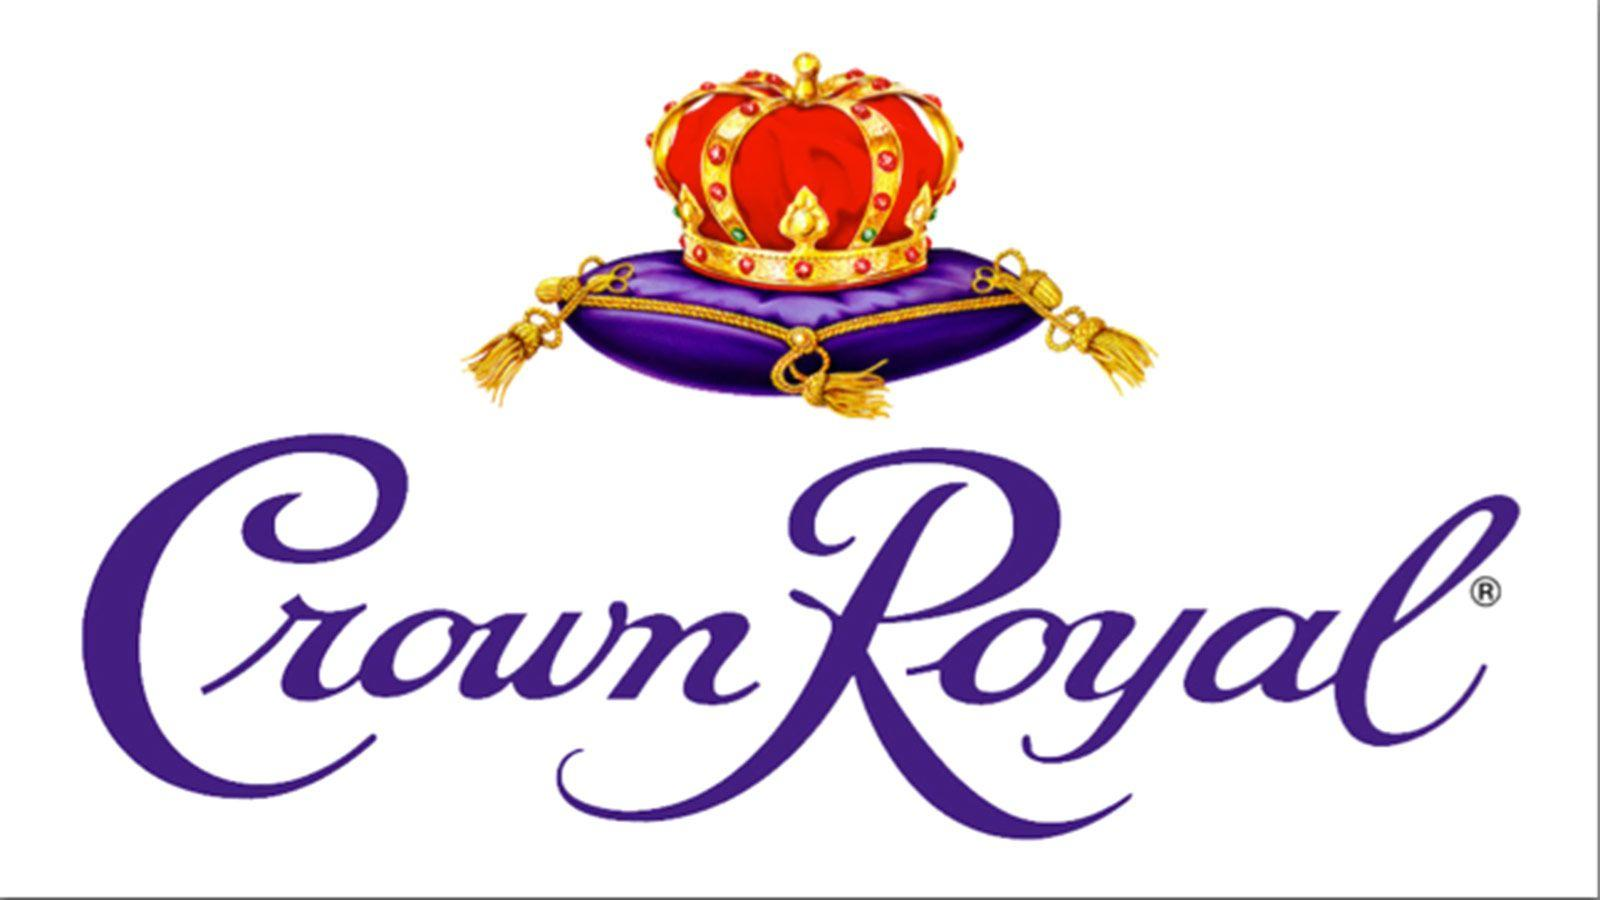 royal logo wallpaper wwwpixsharkcom images galleries